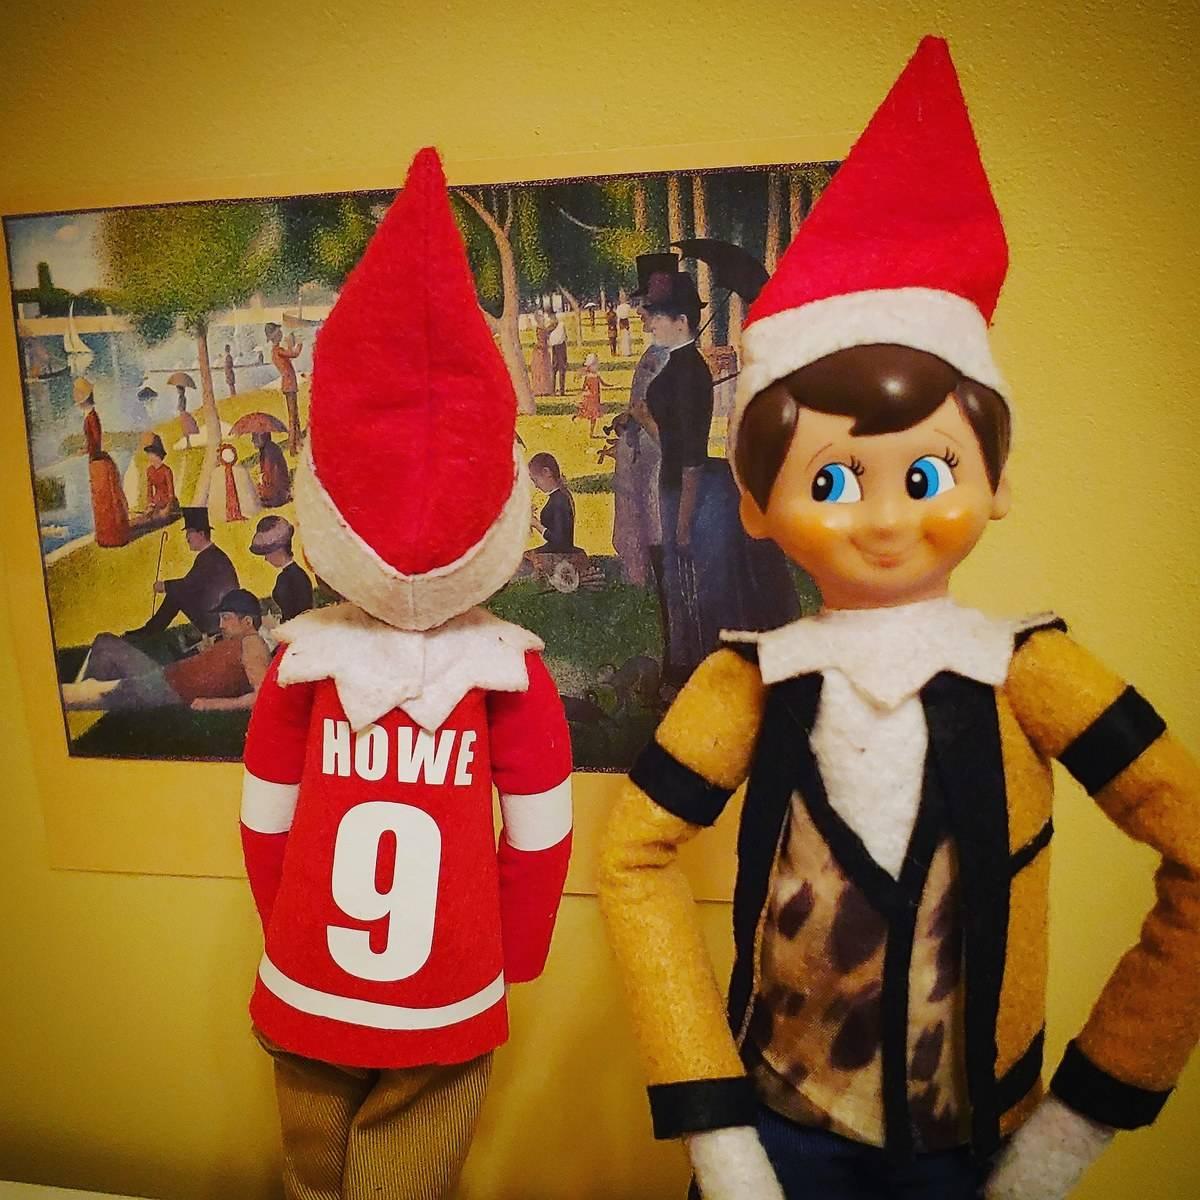 elves in ferris bueller costumes